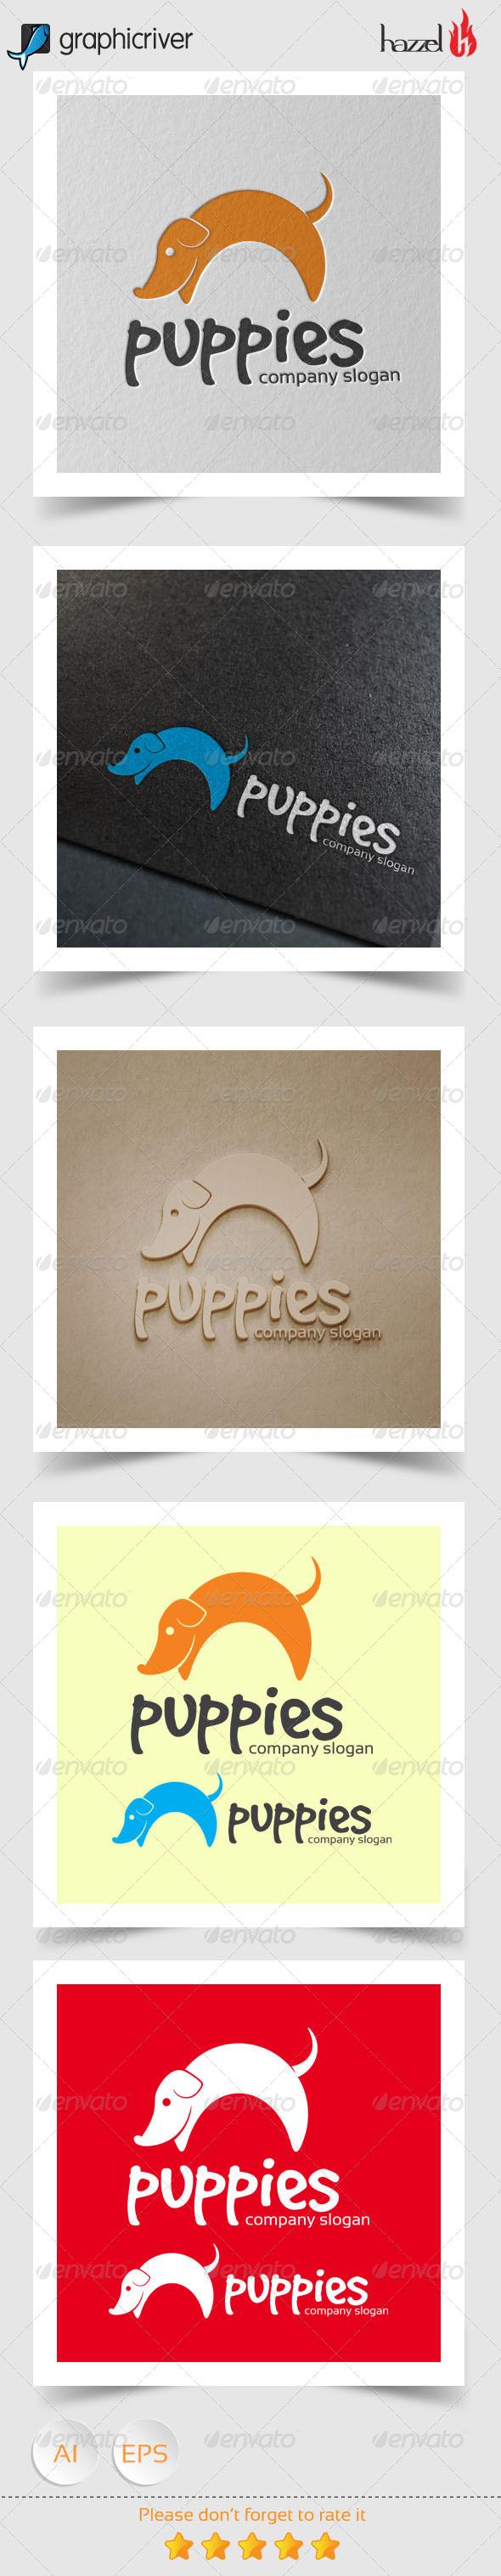 Puppies Logo